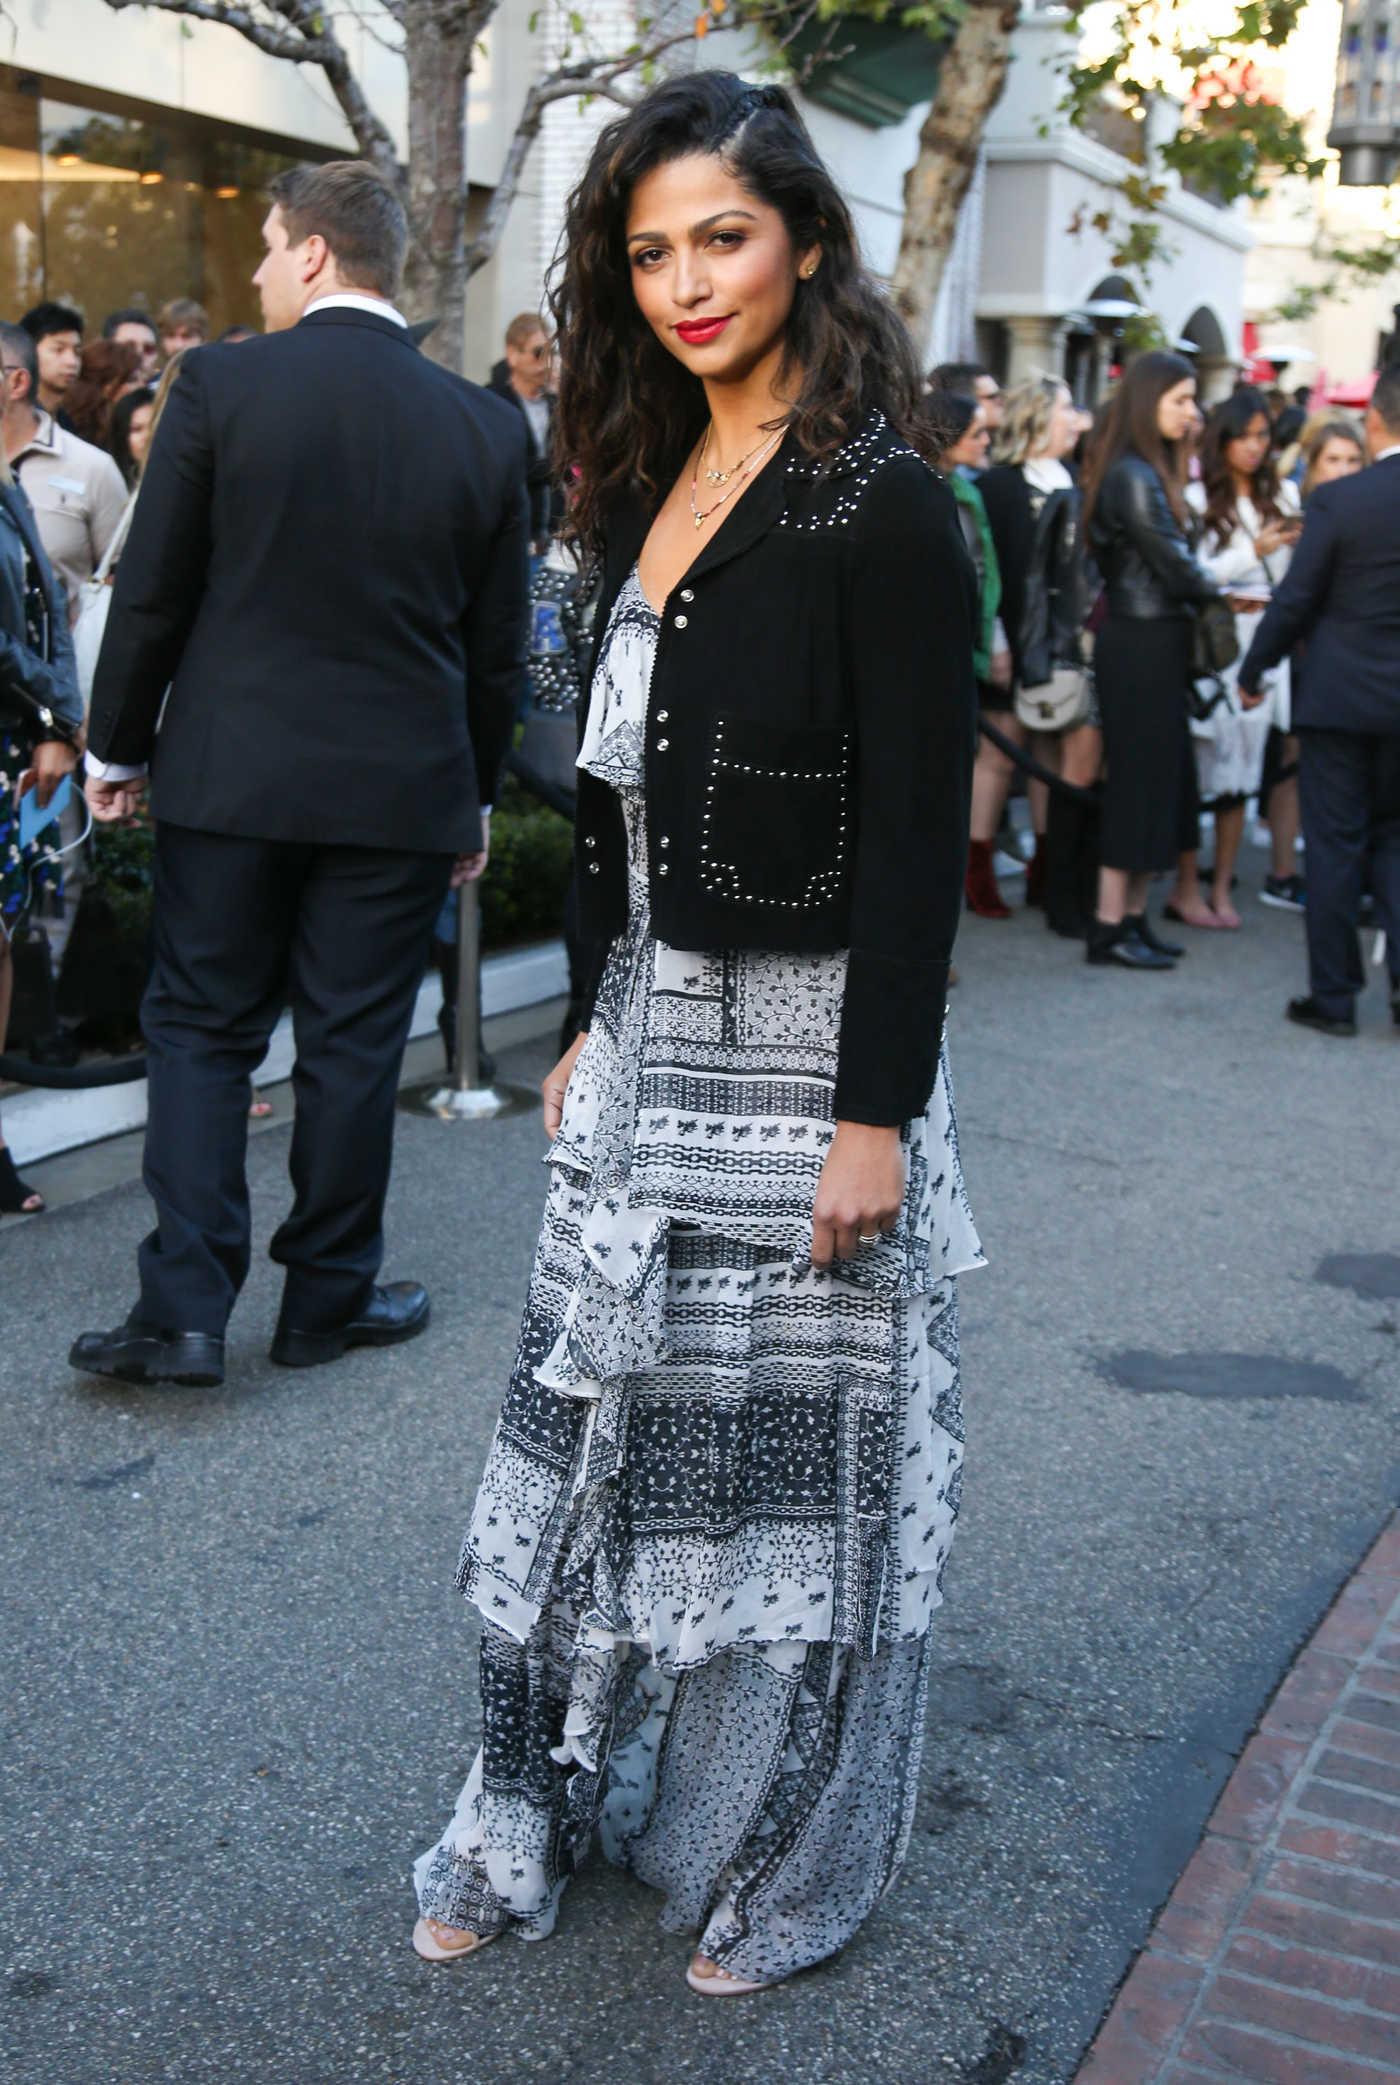 Camila Alves at the Rebecca Minkoff Fashion Show in Los Angeles 02/04/2017